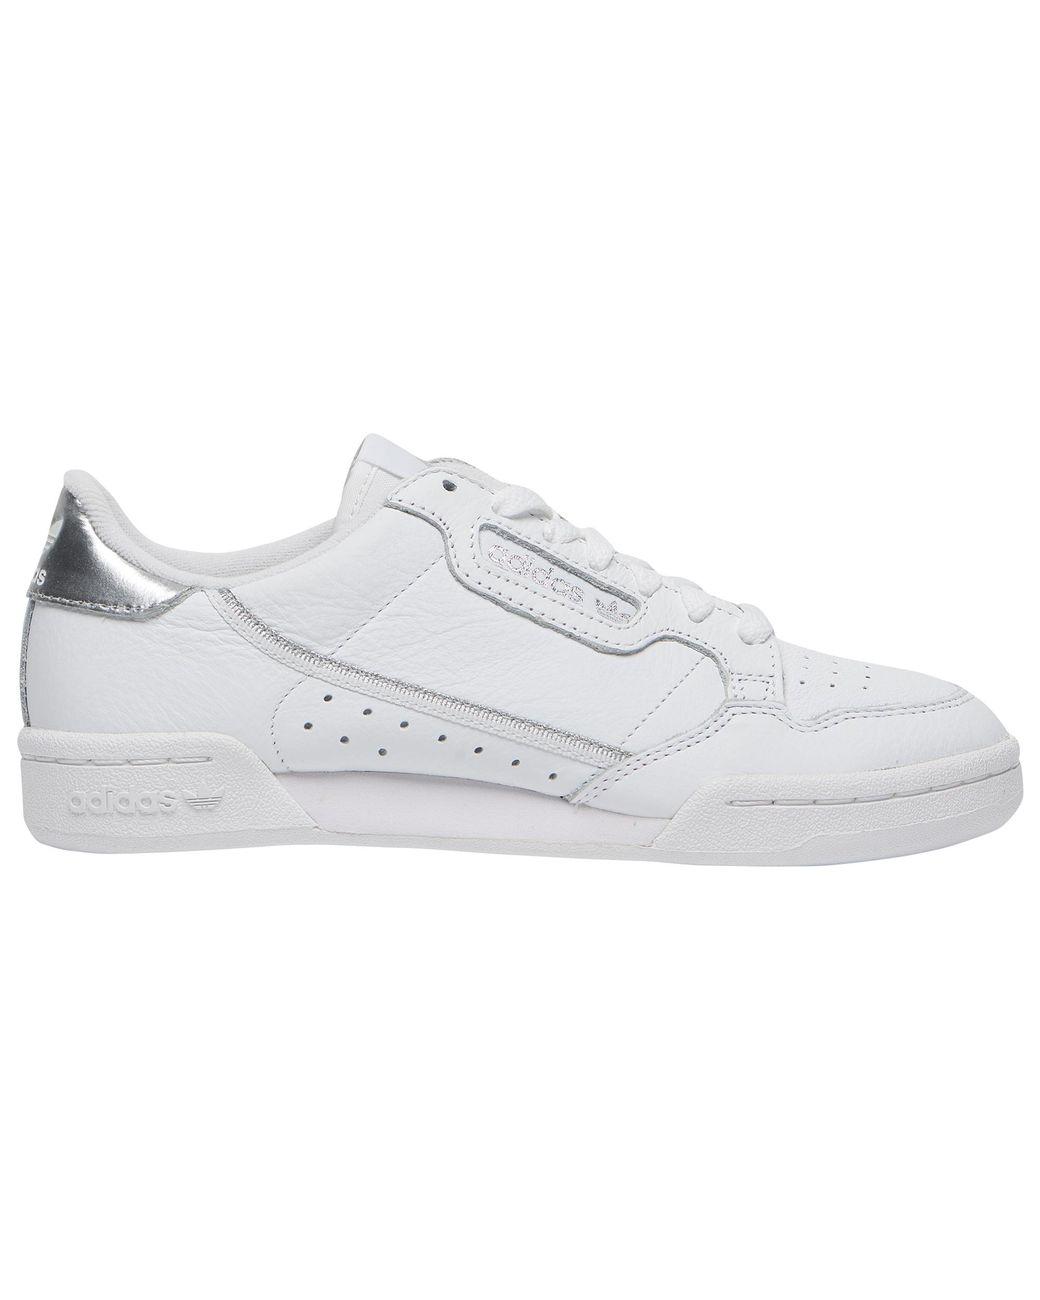 7c490d991e Lyst - adidas Originals Continental 80 in White